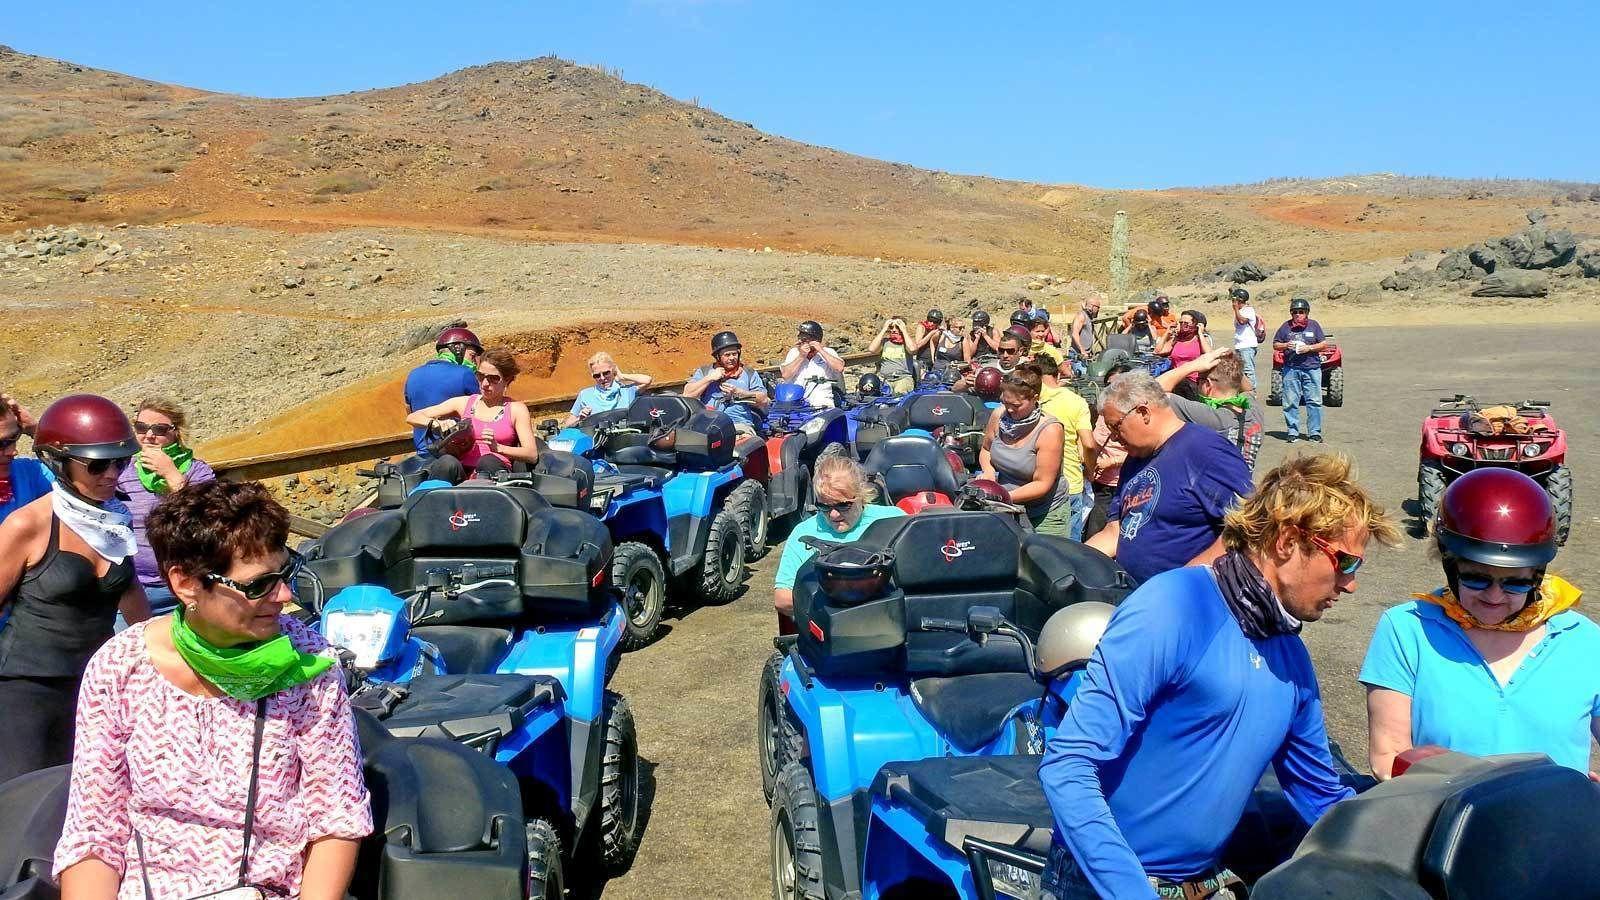 large group of ATV riders gathered in Aruba